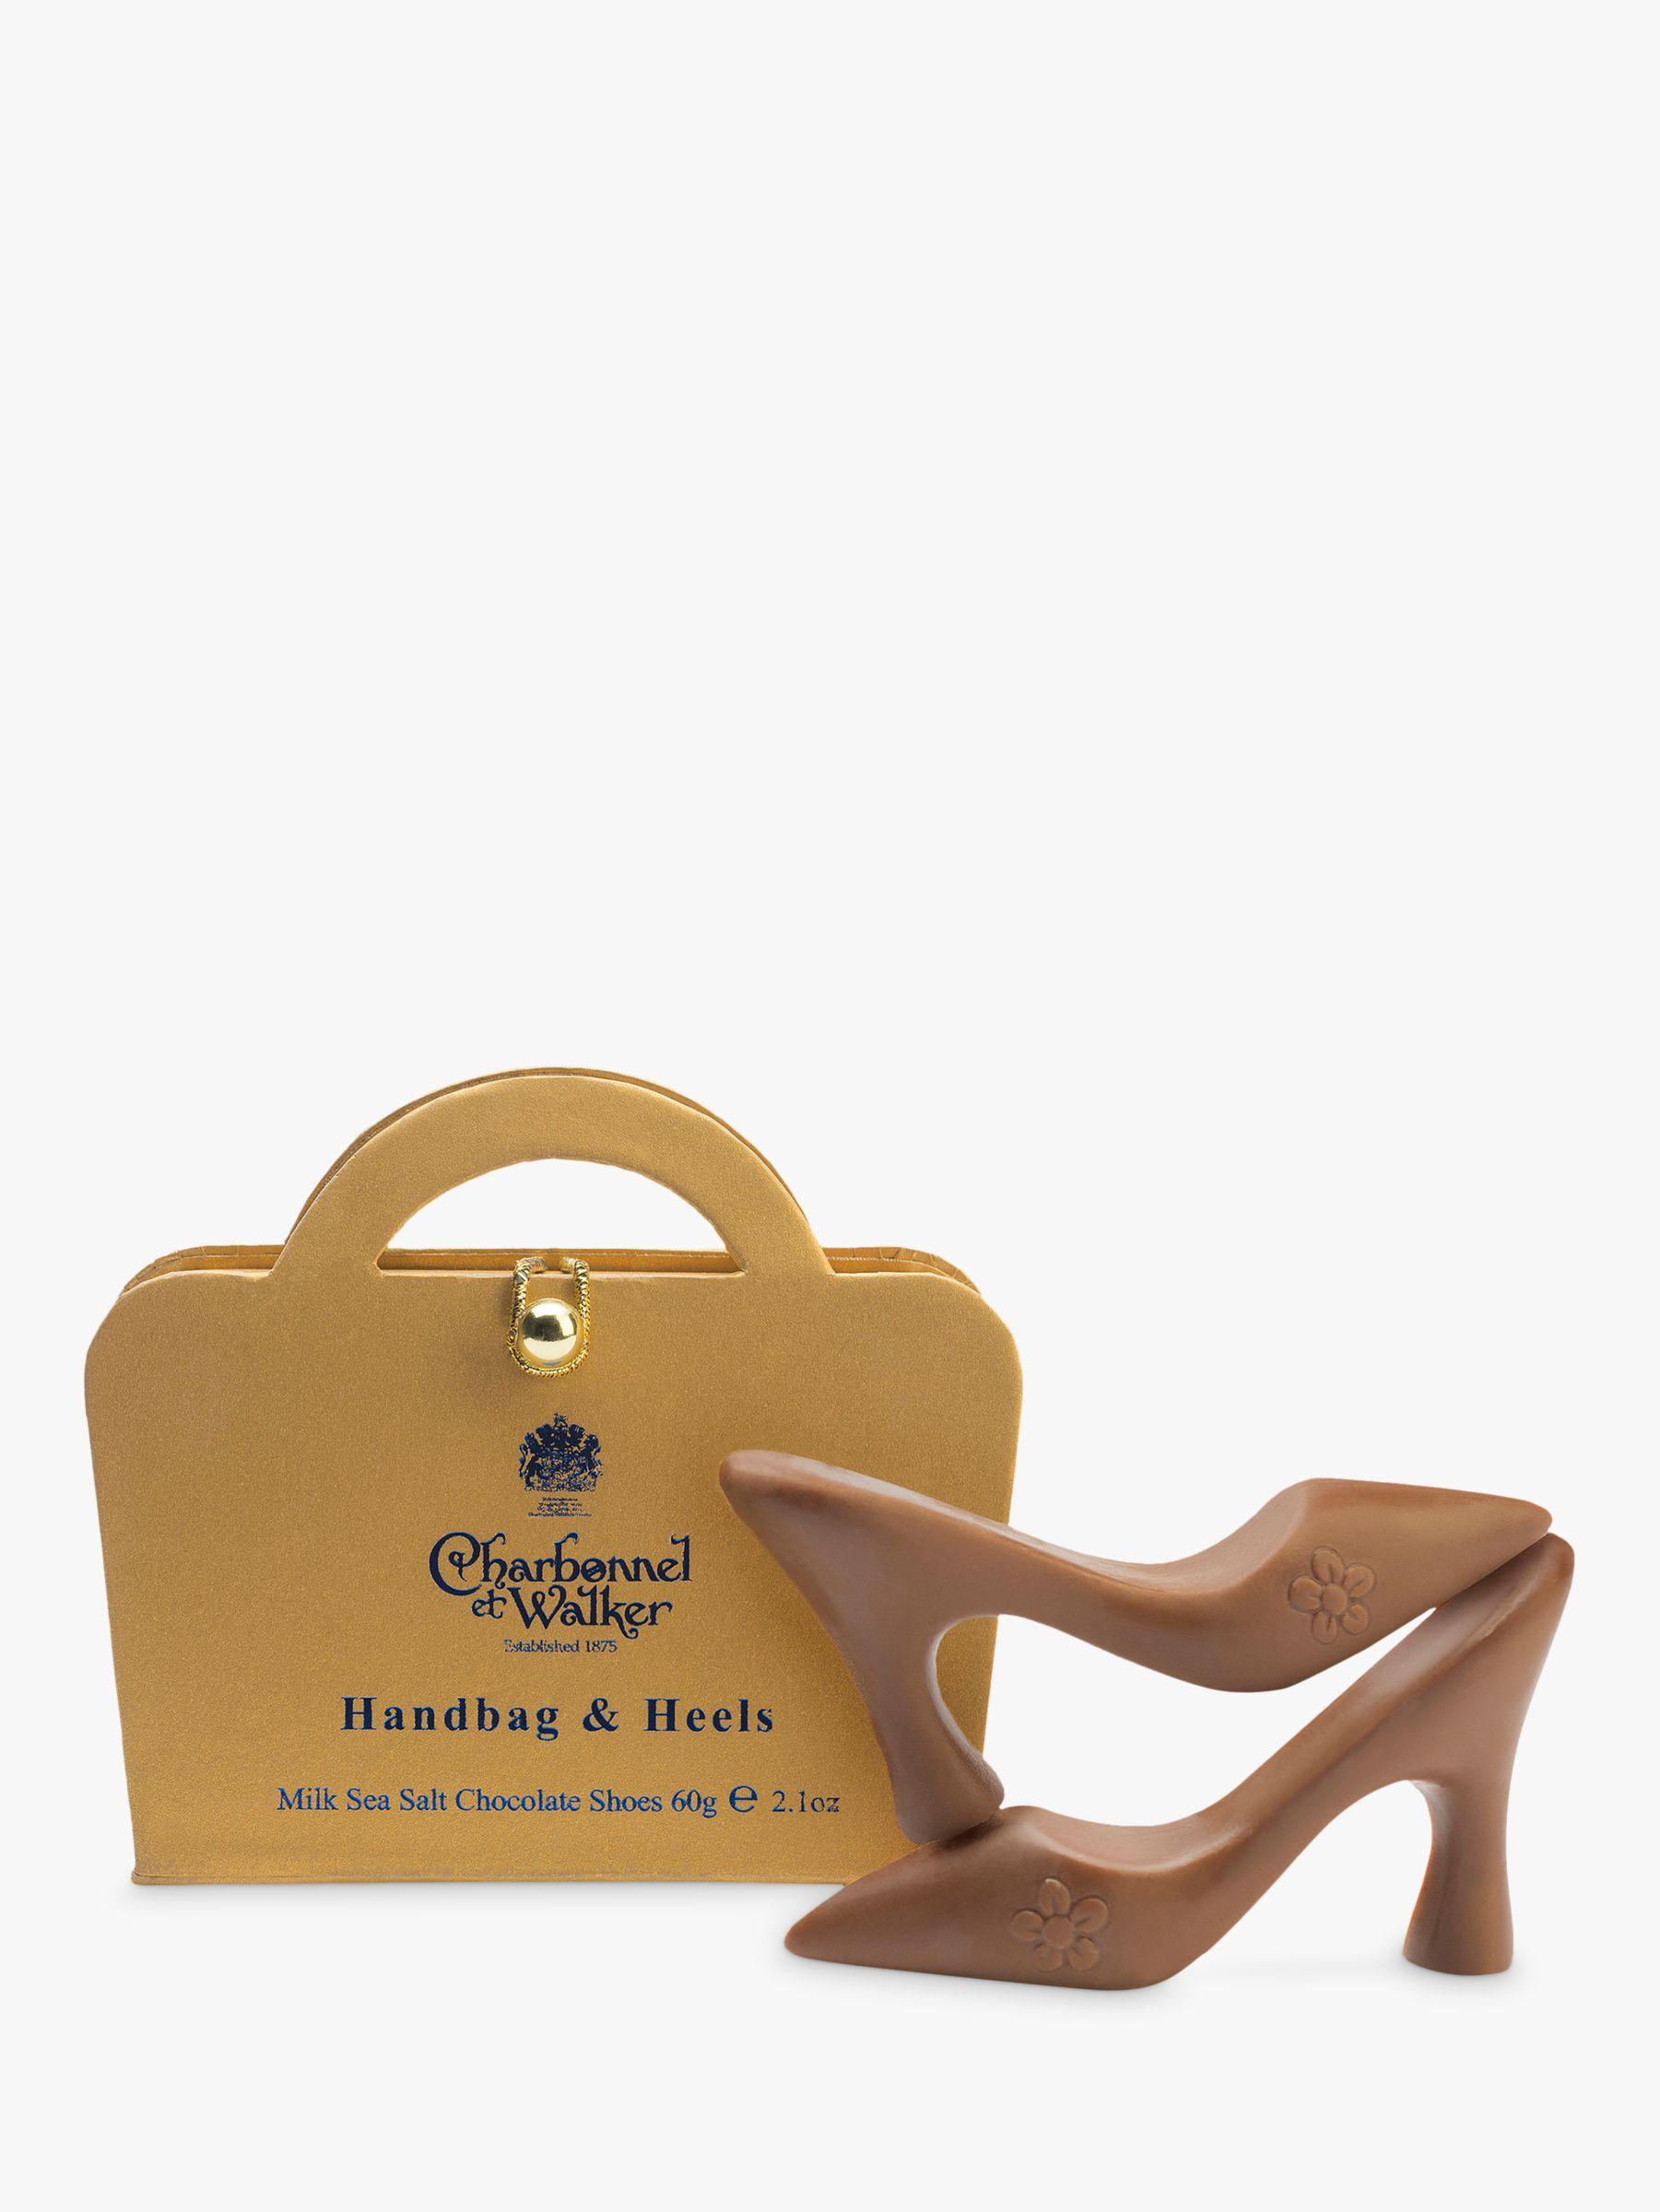 Charbonnel et Walker Charbonnel et Walker Milk Sea Salt Chocolate Shoes, 60g